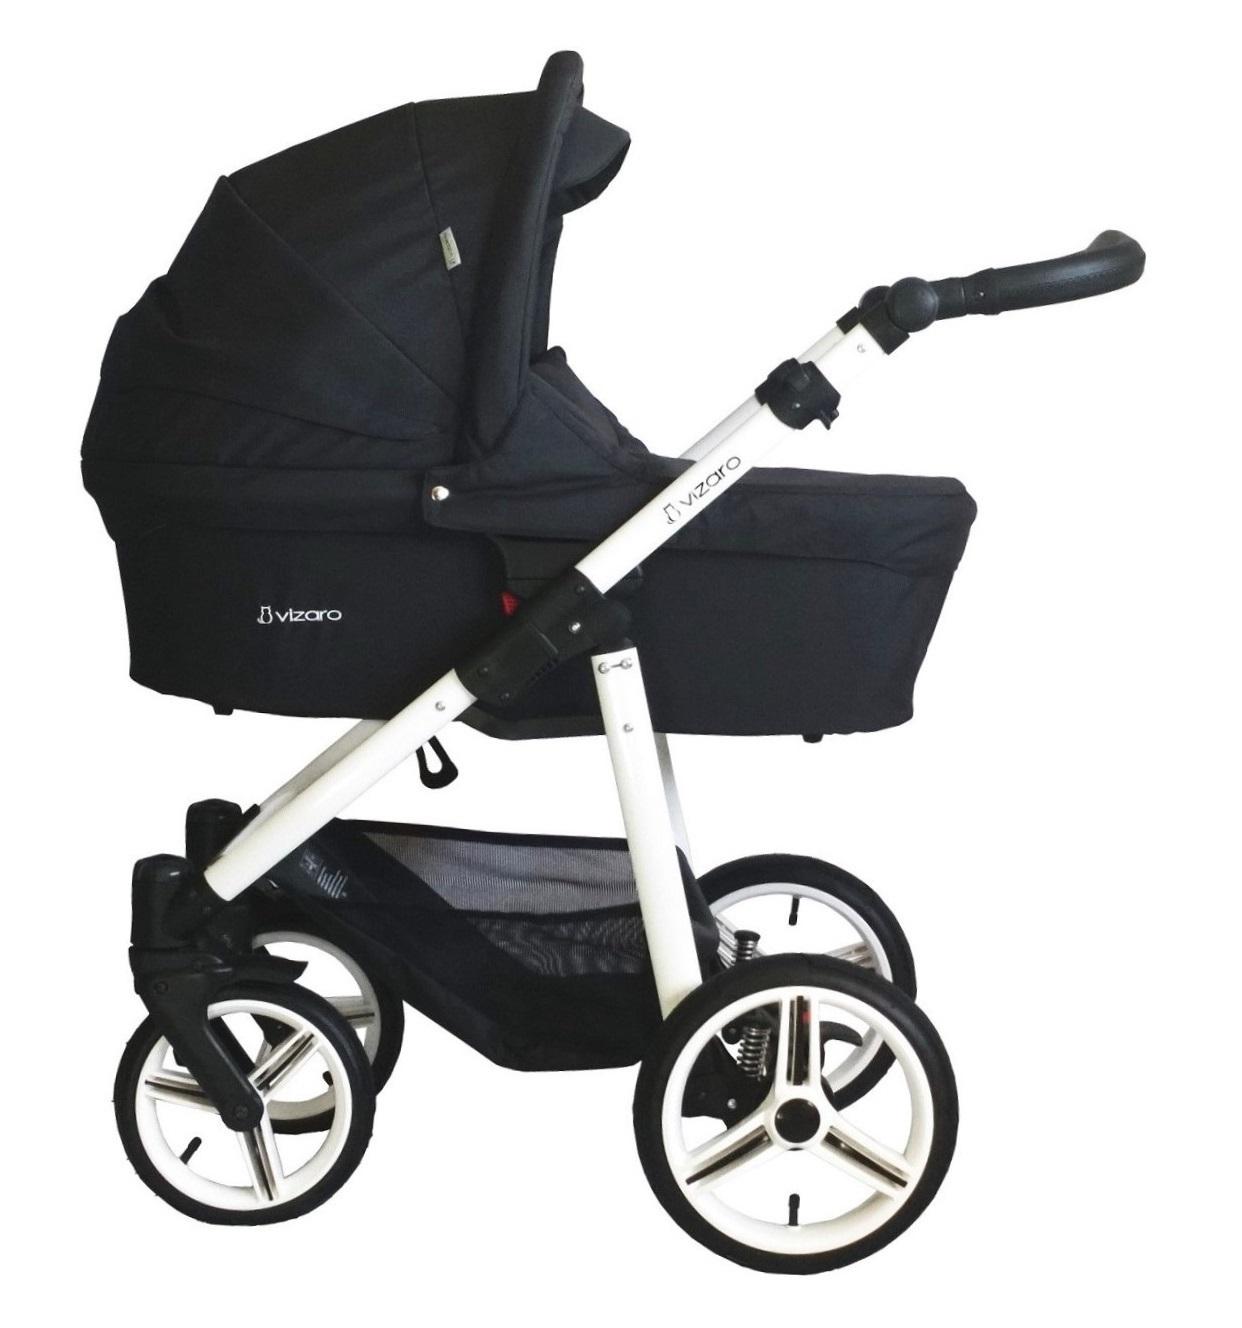 Comprar carritos de beb todoterreno de vizaro desde 499 for Servicio tecnico jane